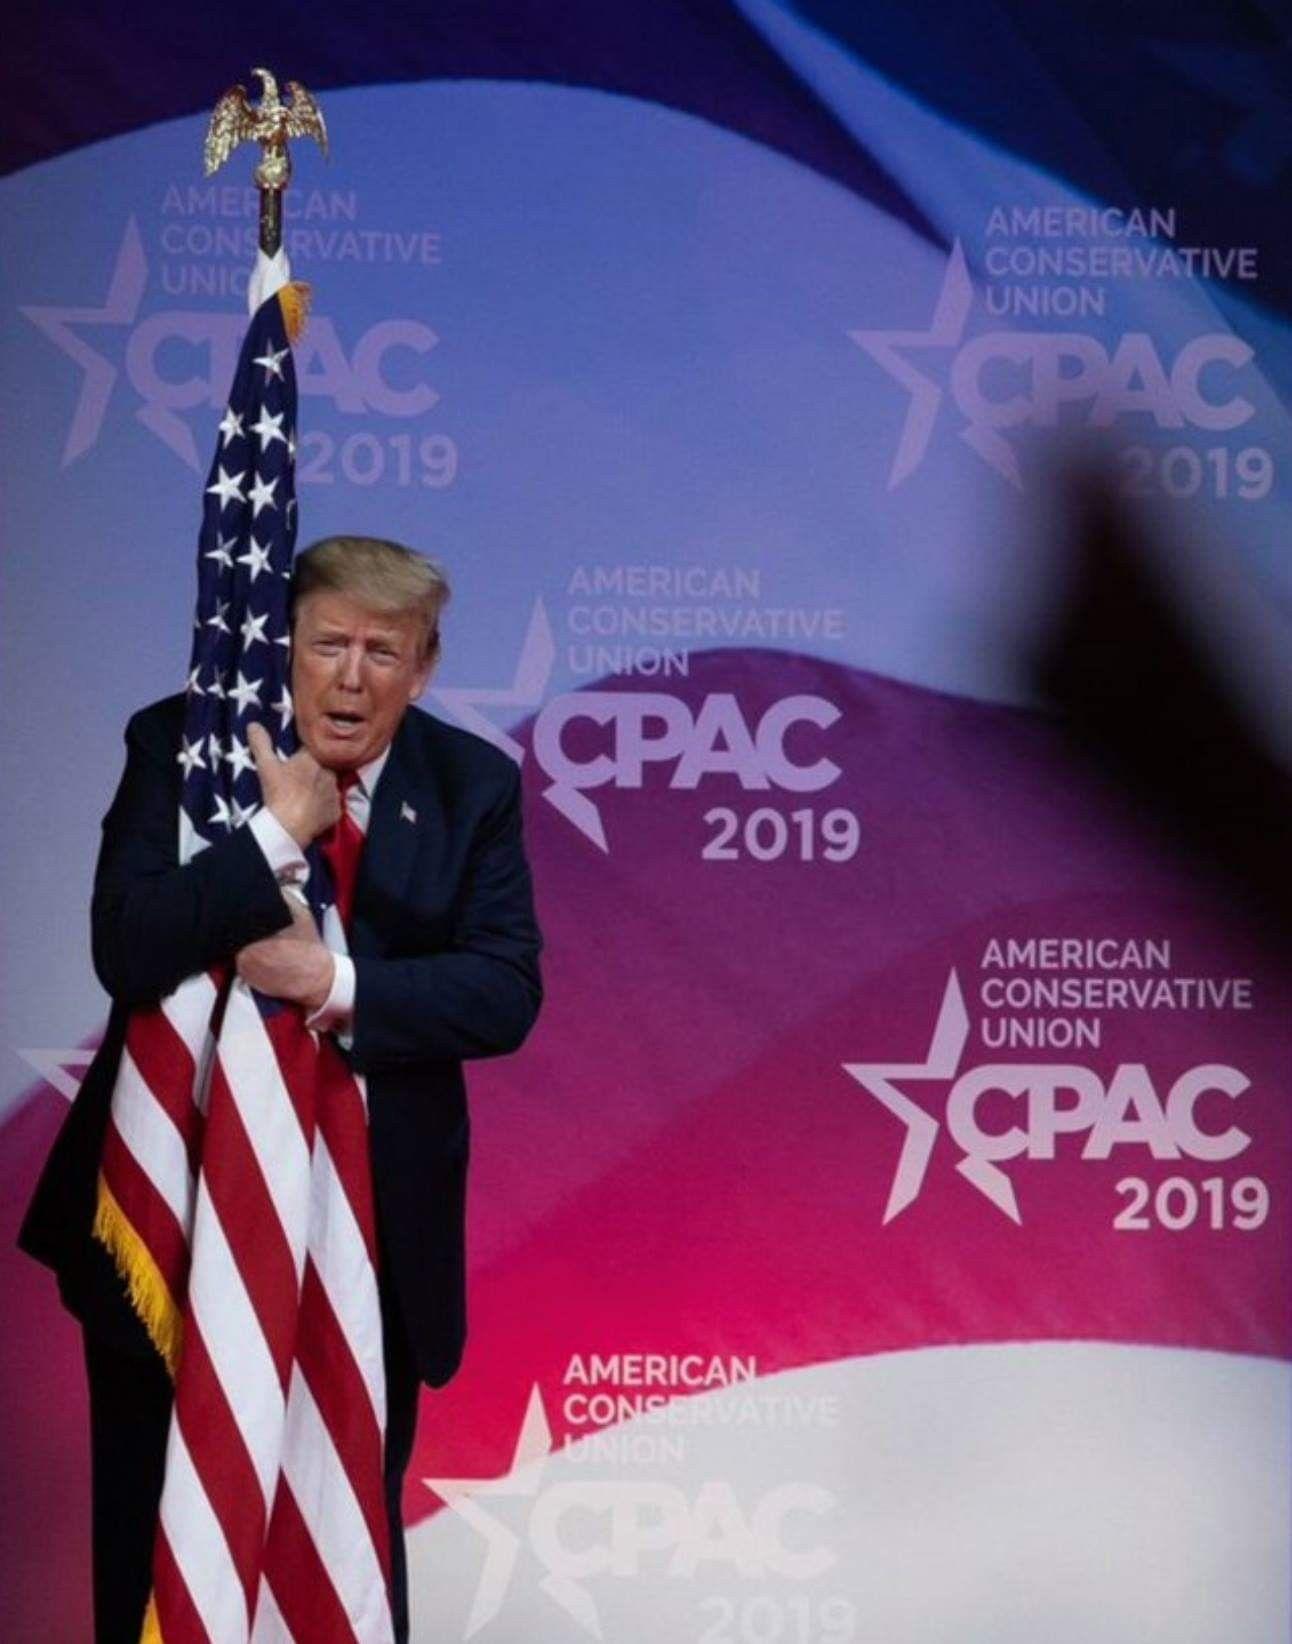 Pin By Mazen On Usa Talent Show American Union Trump Photo